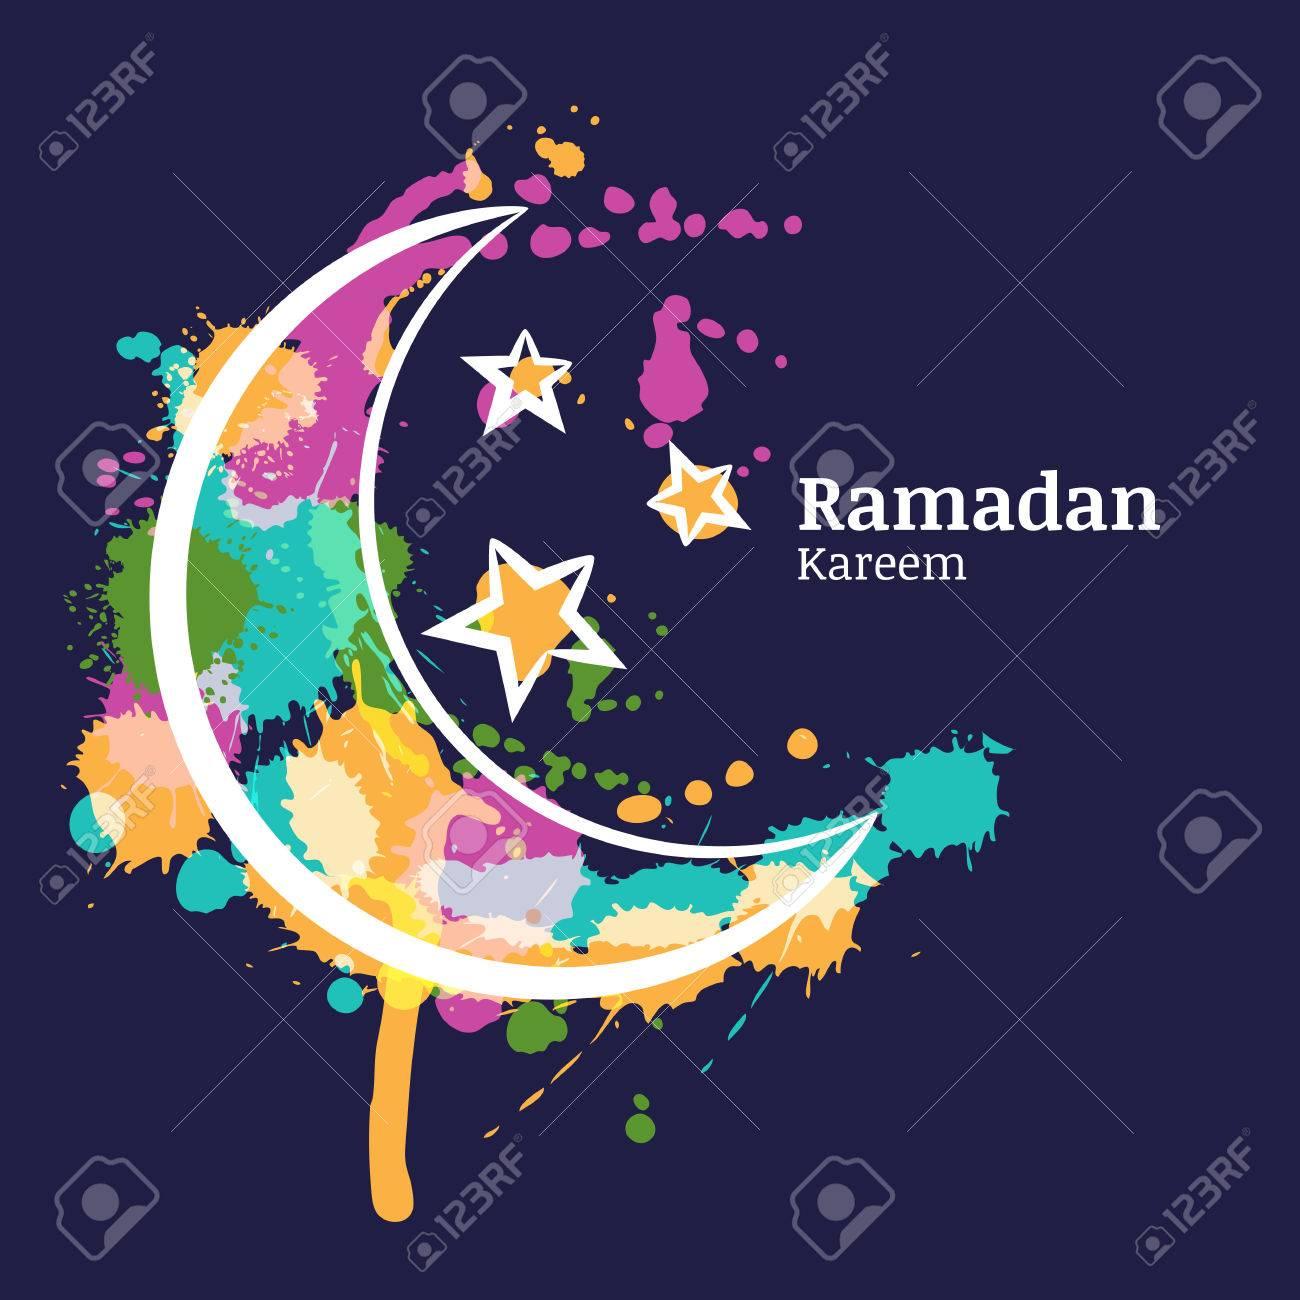 Ramadan greeting card with watercolor decorative moon and stars ramadan greeting card with watercolor decorative moon and stars on blue night sky ramadan kareem m4hsunfo